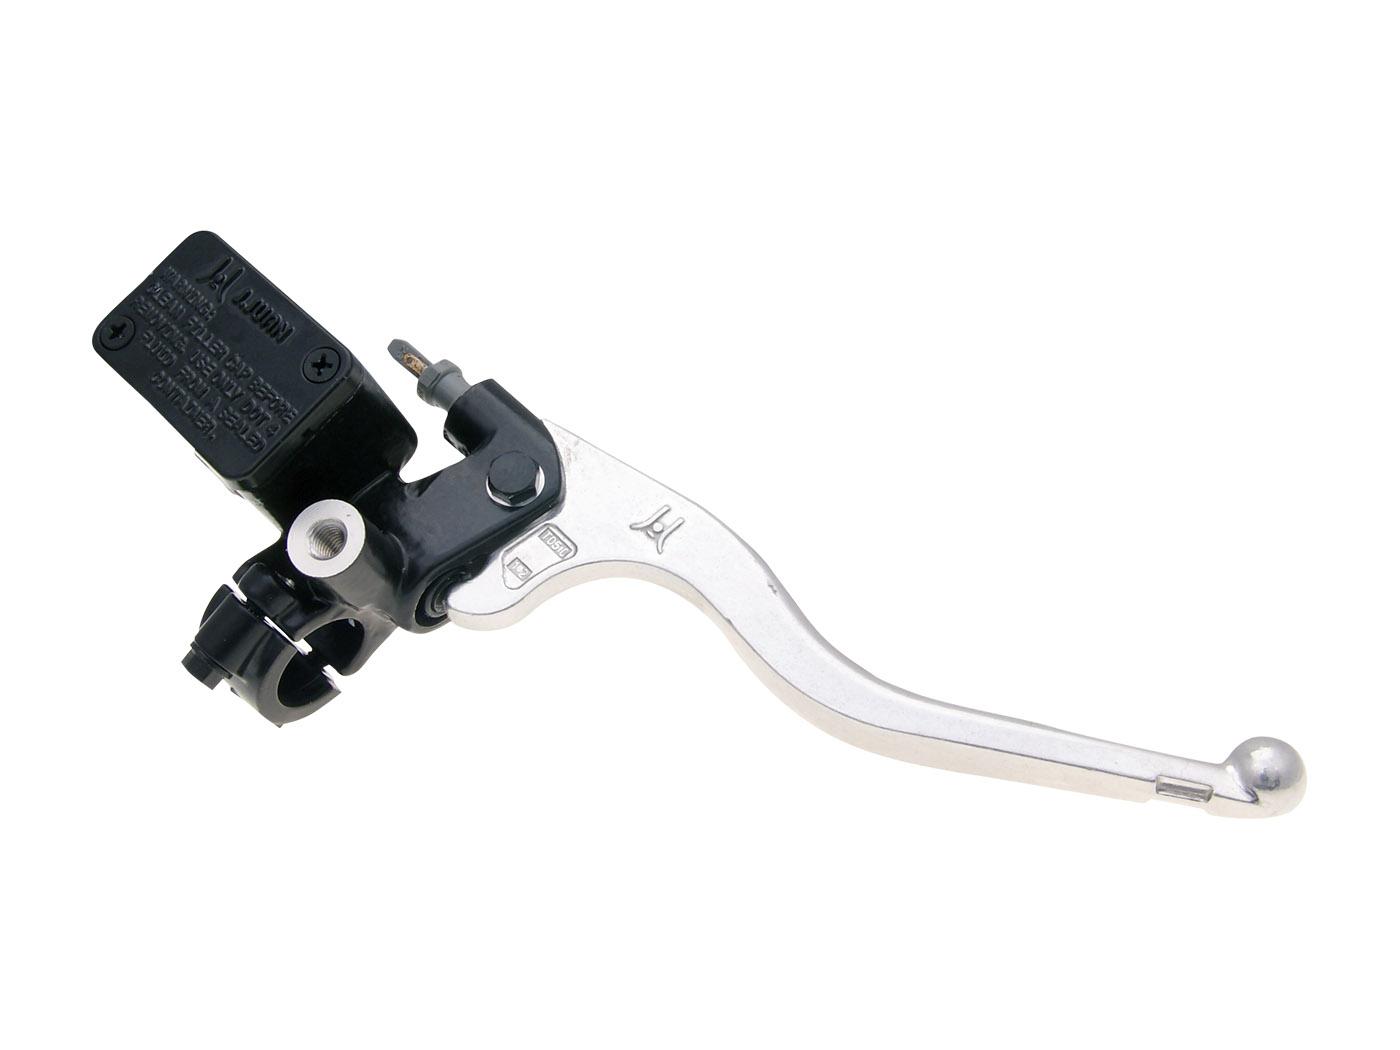 Engine Water Pump Pulley Bolt R766RM for Passat Beetle CC Eos GTI Jetta Tiguan